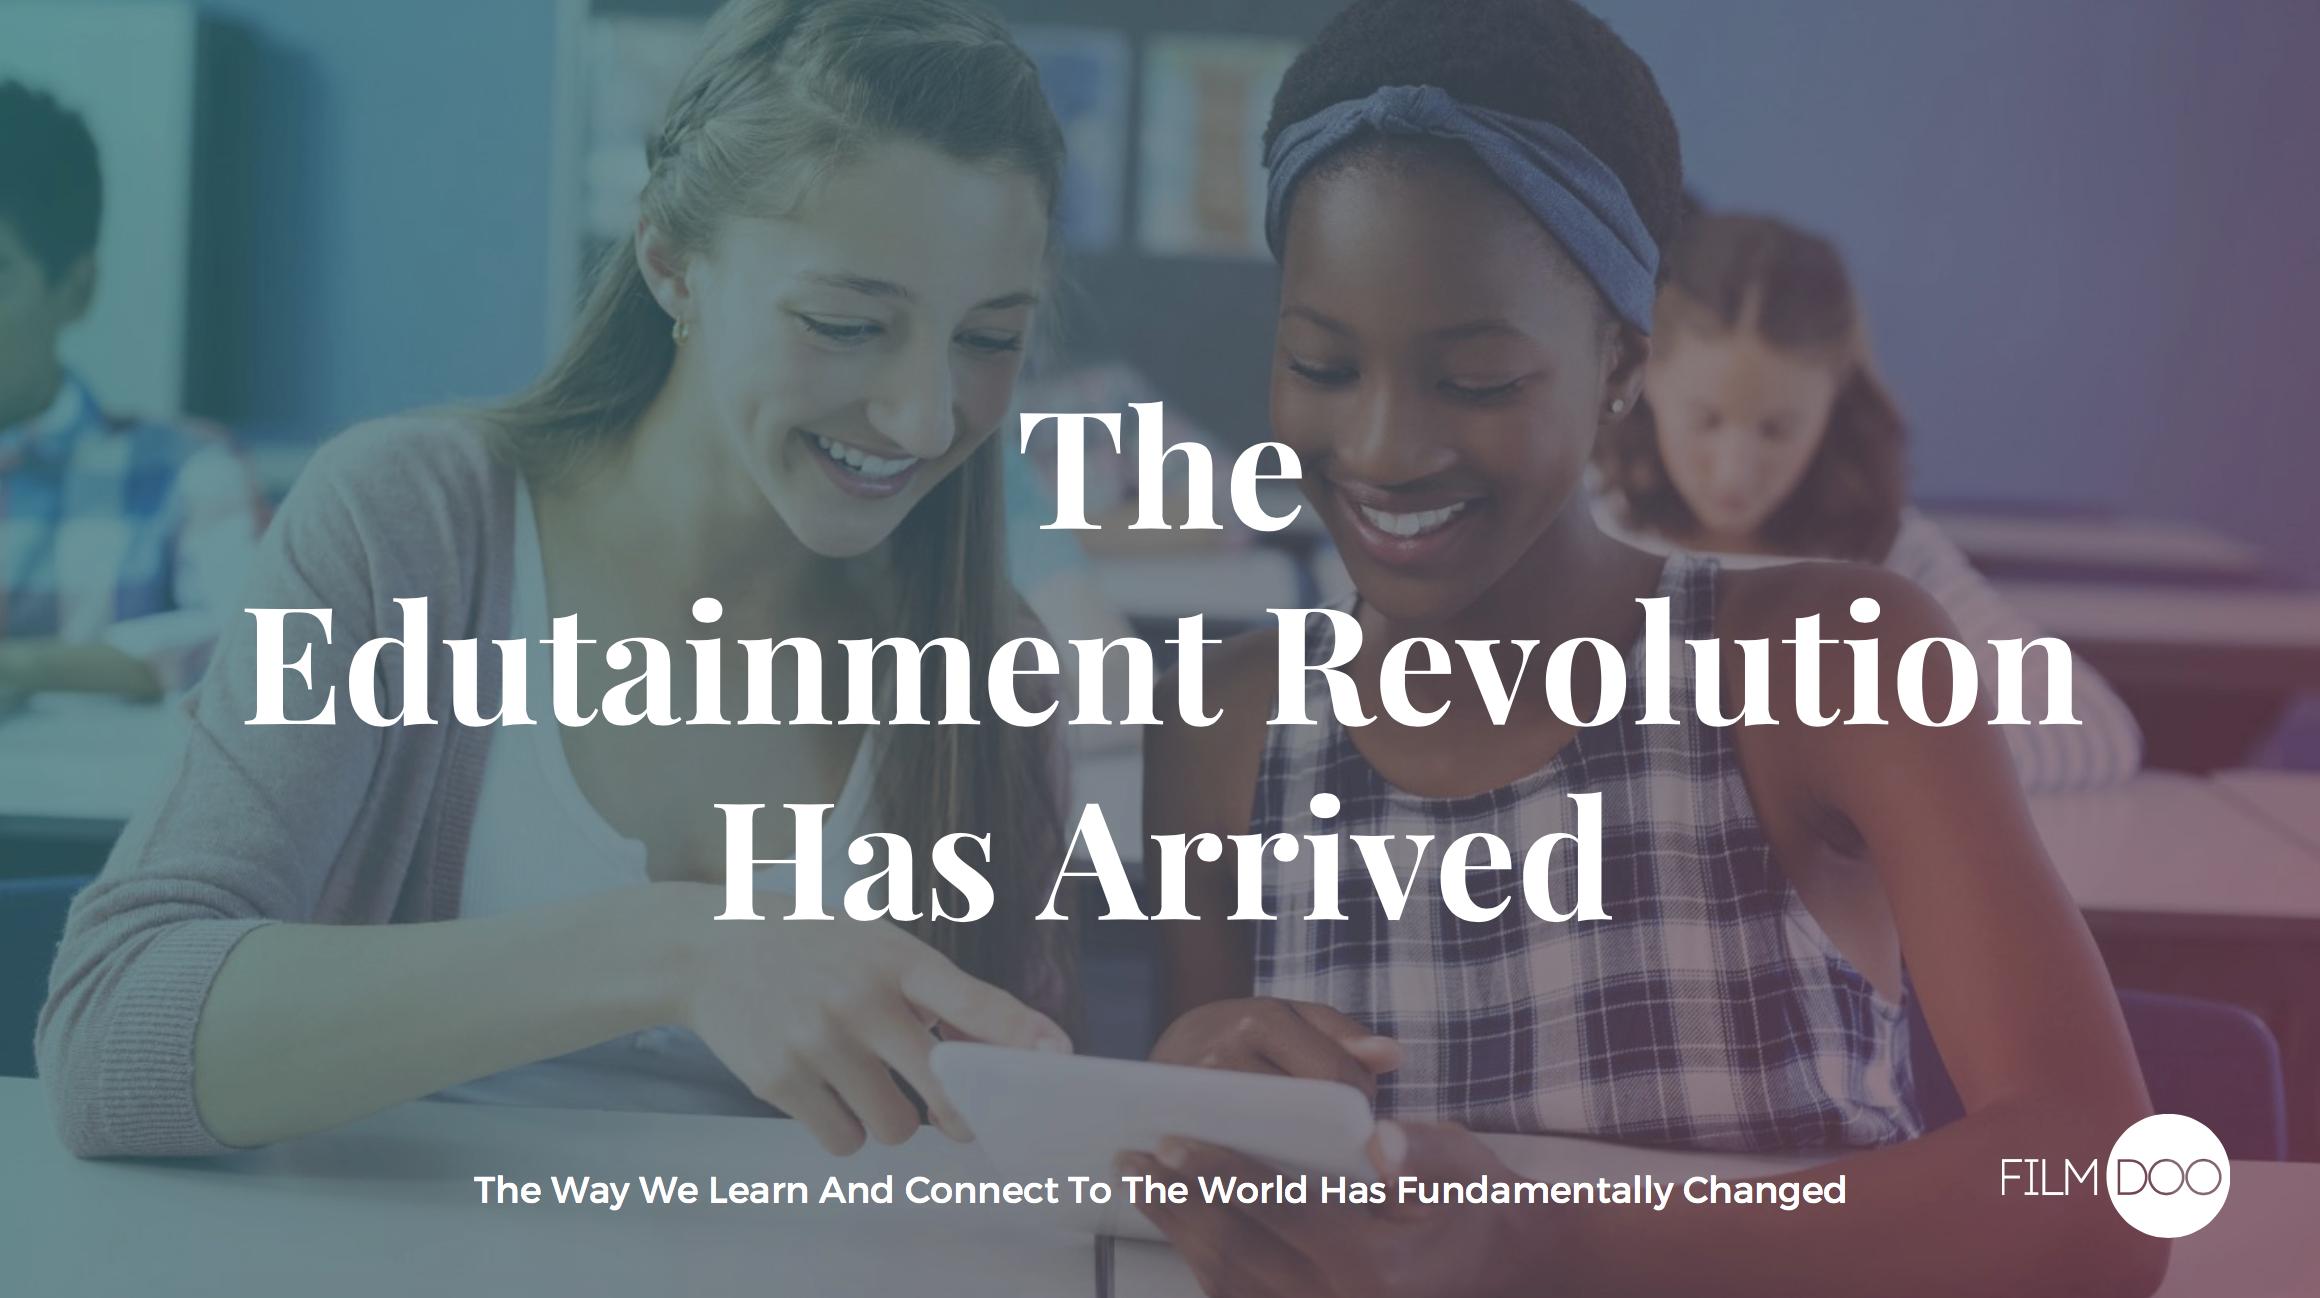 FilmDoo - The Edutainment Revolution